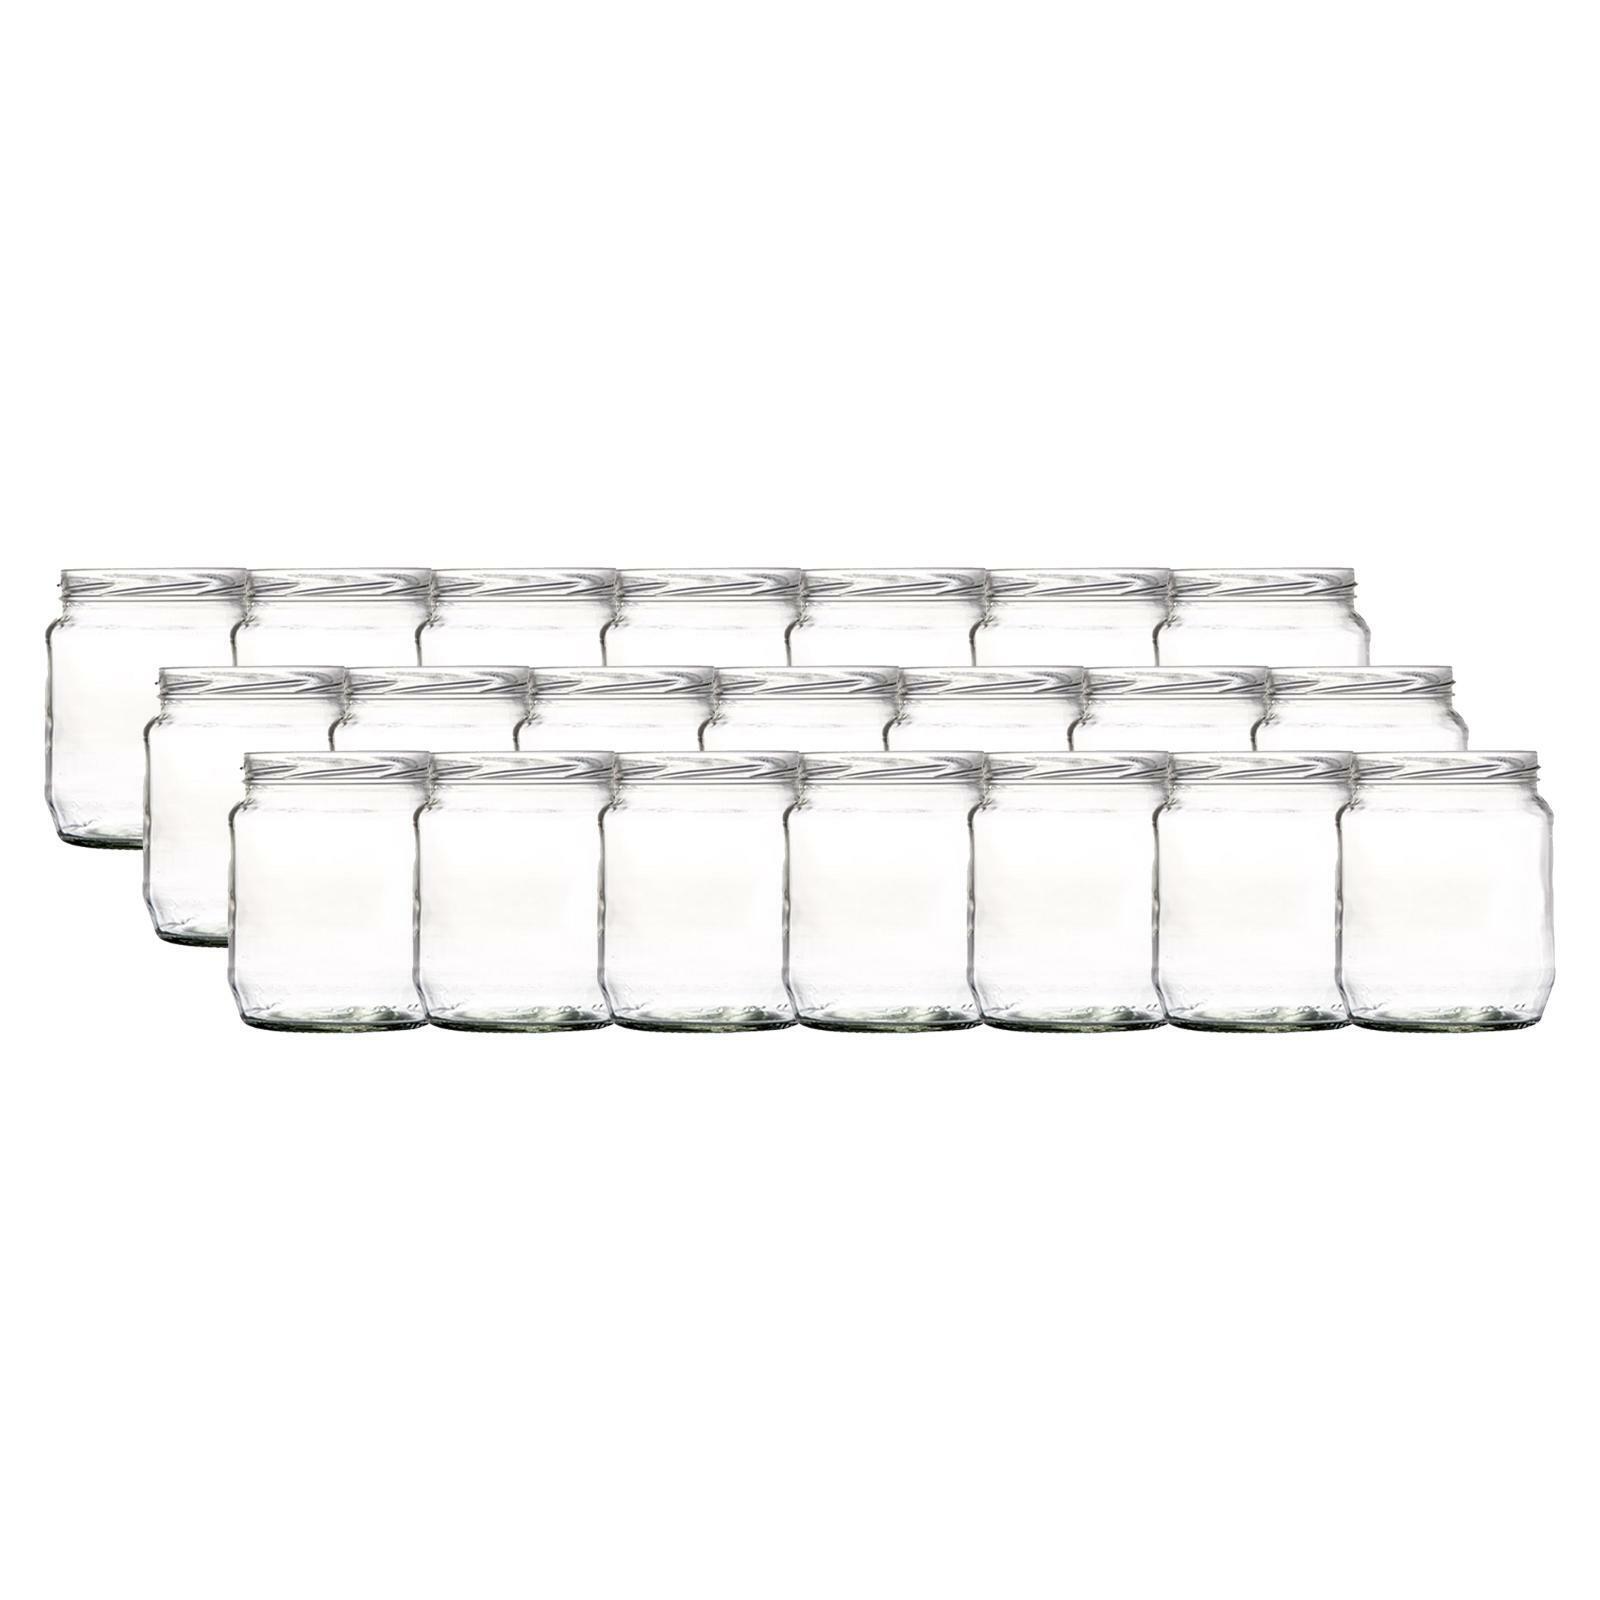 bierre store vasetti in vetro imb. 63mm da 212ml 24 pezzi per bollitura